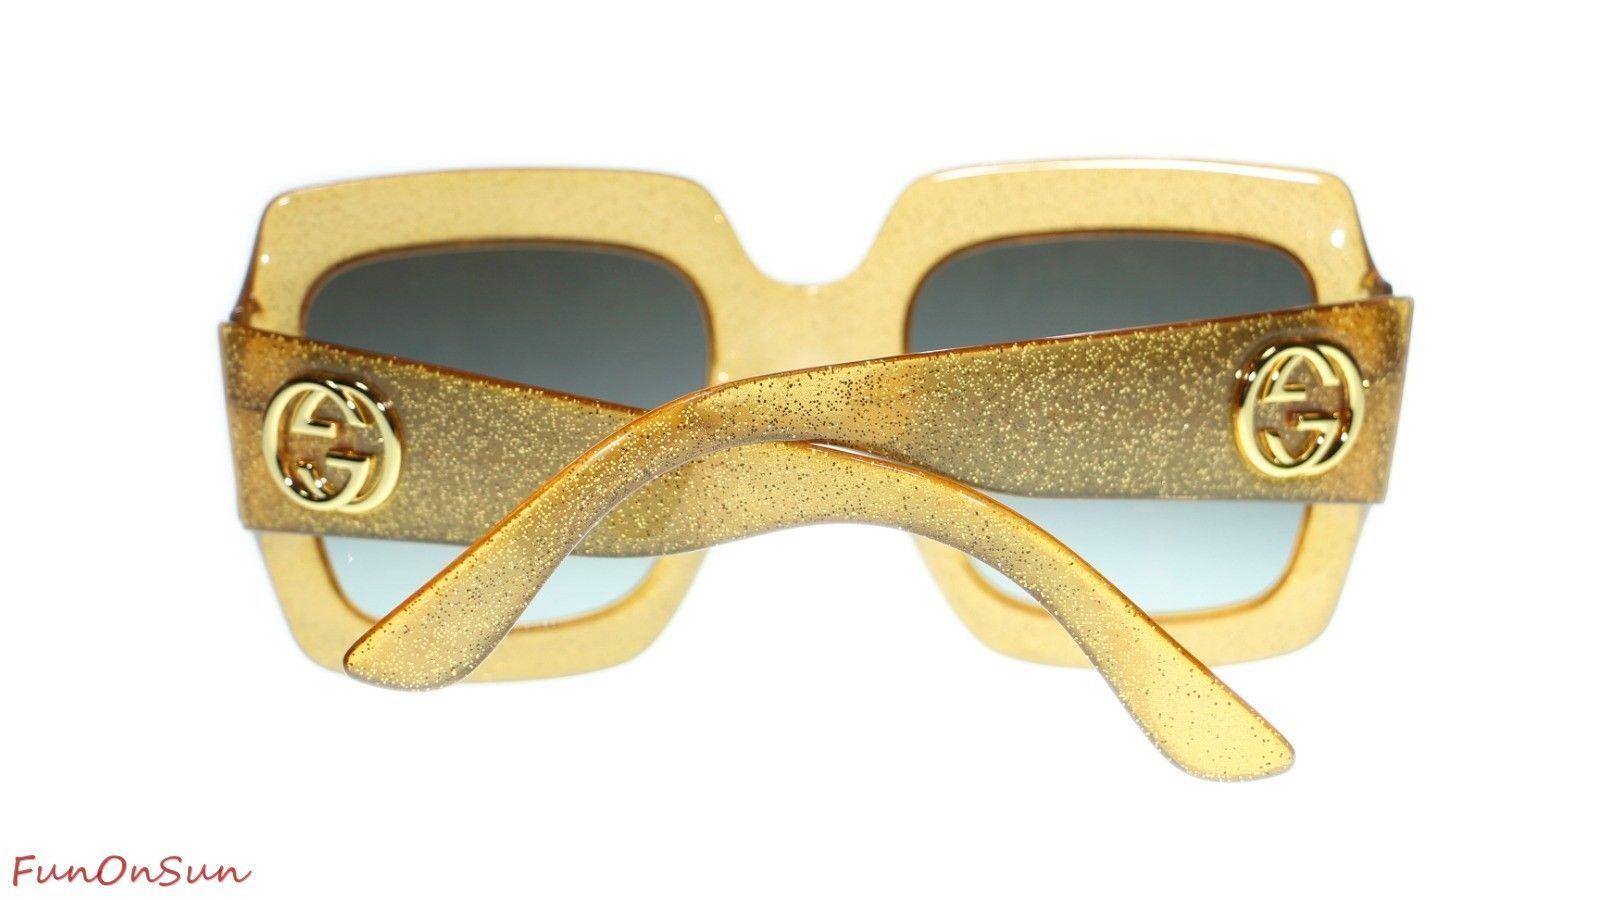 cf2fe06395f ... Gucci Women Square Sunglasses GG0053S 006 Gold Grey Gradient Lens 54mm  Authentic ...